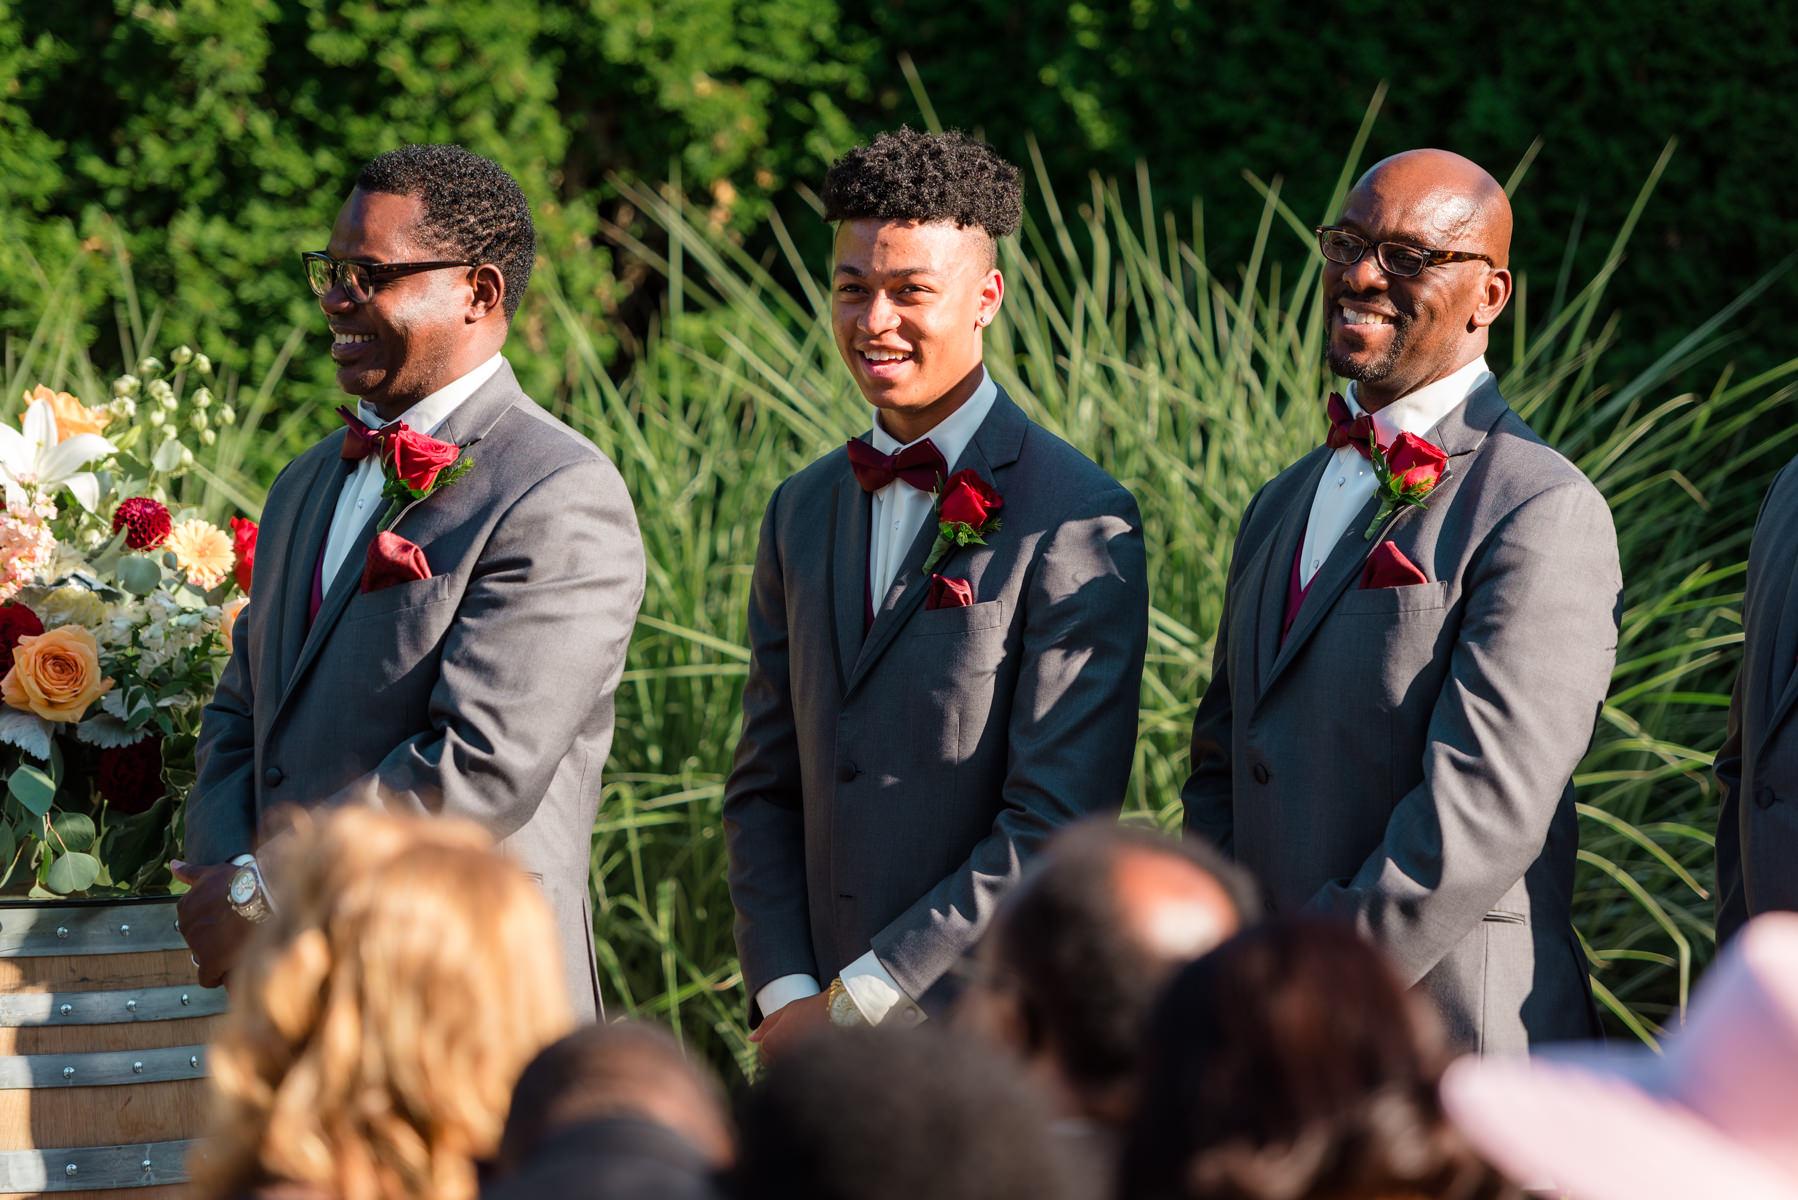 Andrew Tat - Documentary Wedding Photography - Columbia Winery - Woodinville, Washington -Patricia & Teffin - 13.jpg